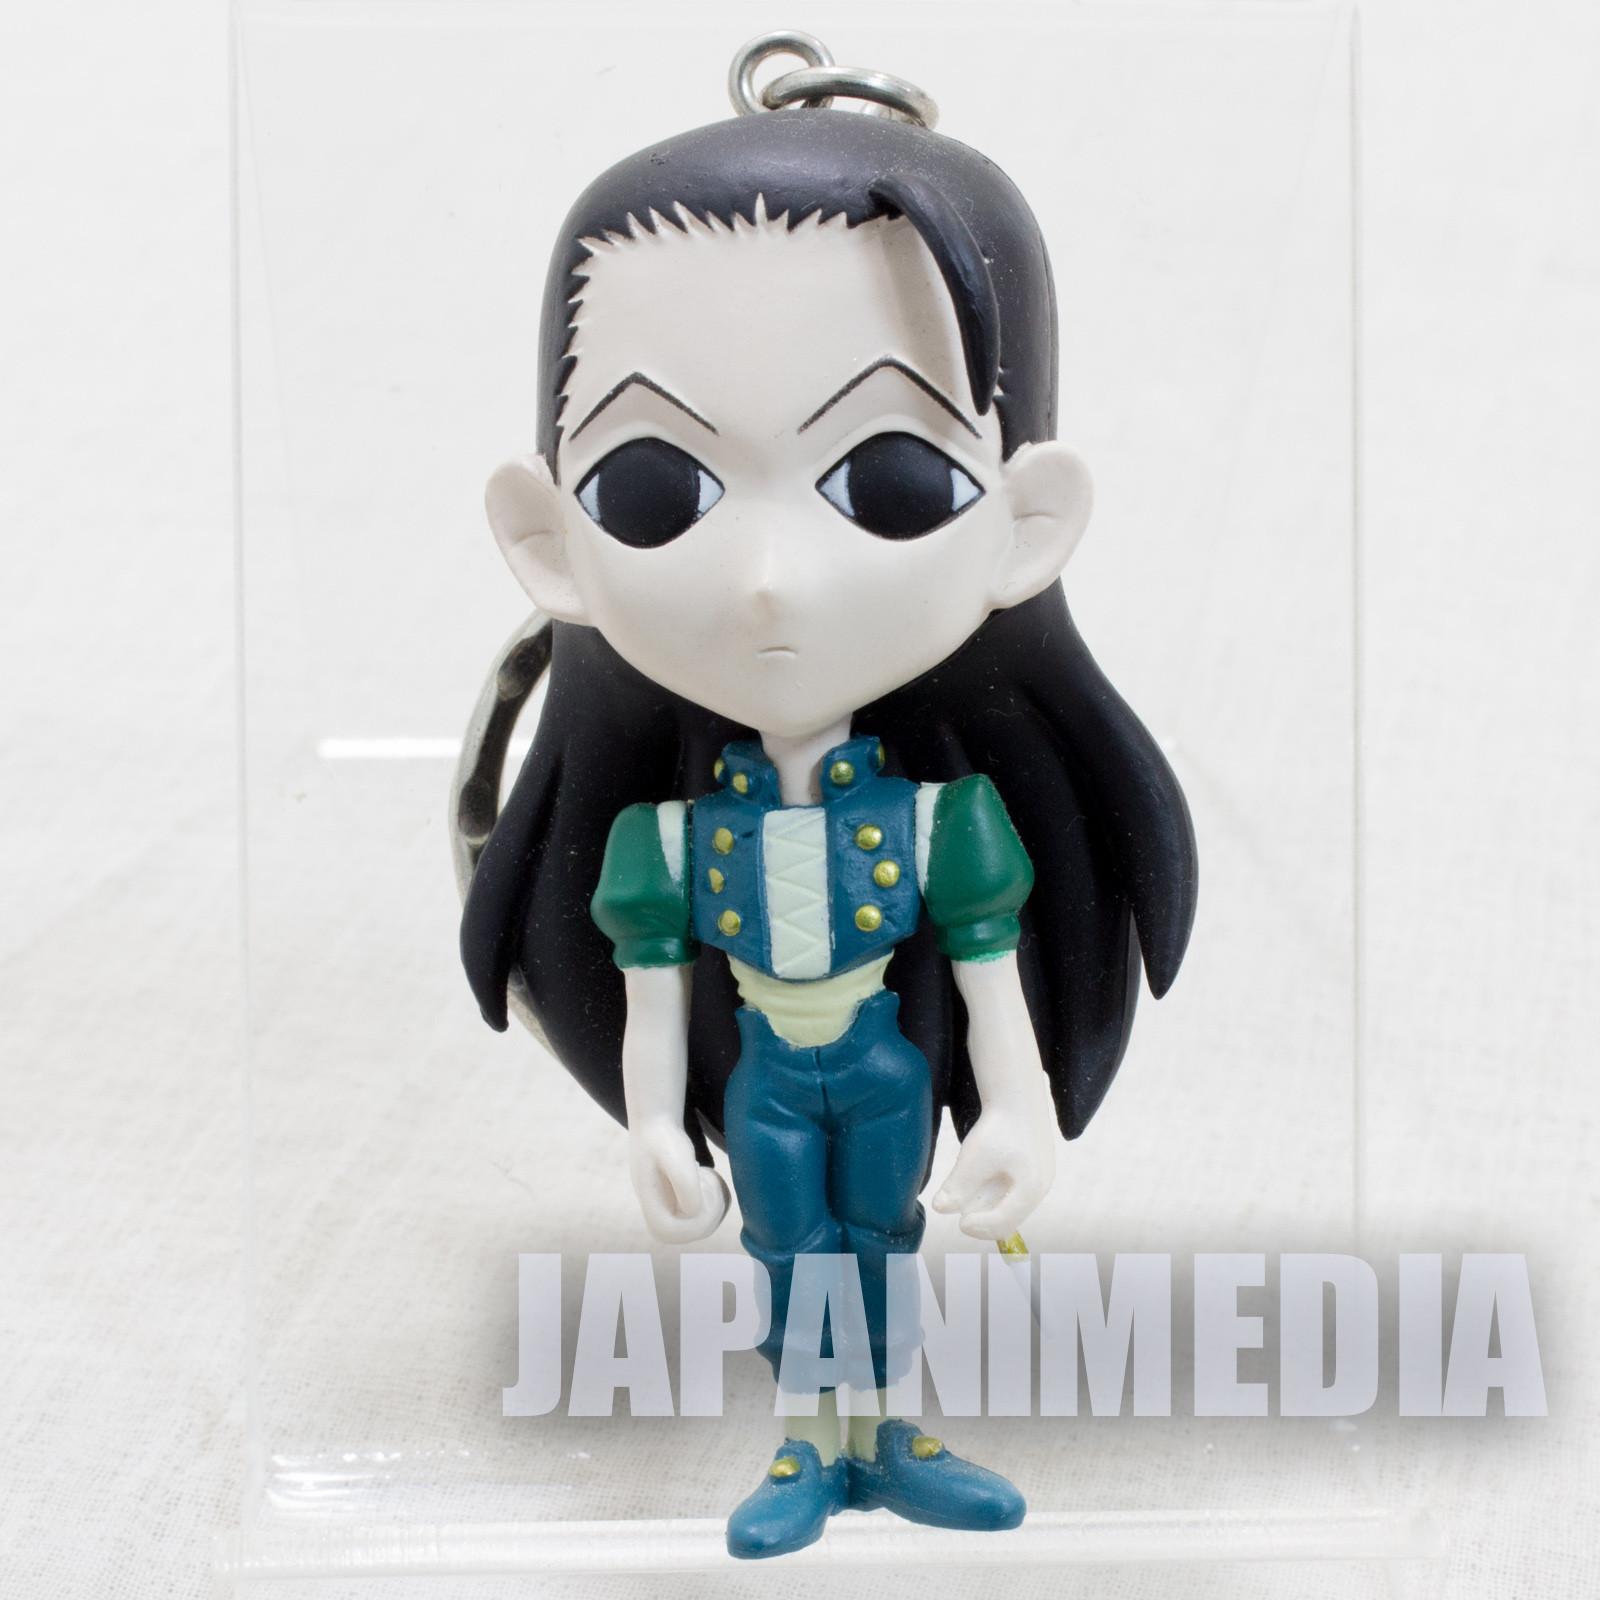 RARE! HUNTER x HUNTER Illumi Zoldyck Mini Figure Key Holder Chain JAPAN ANIME 2